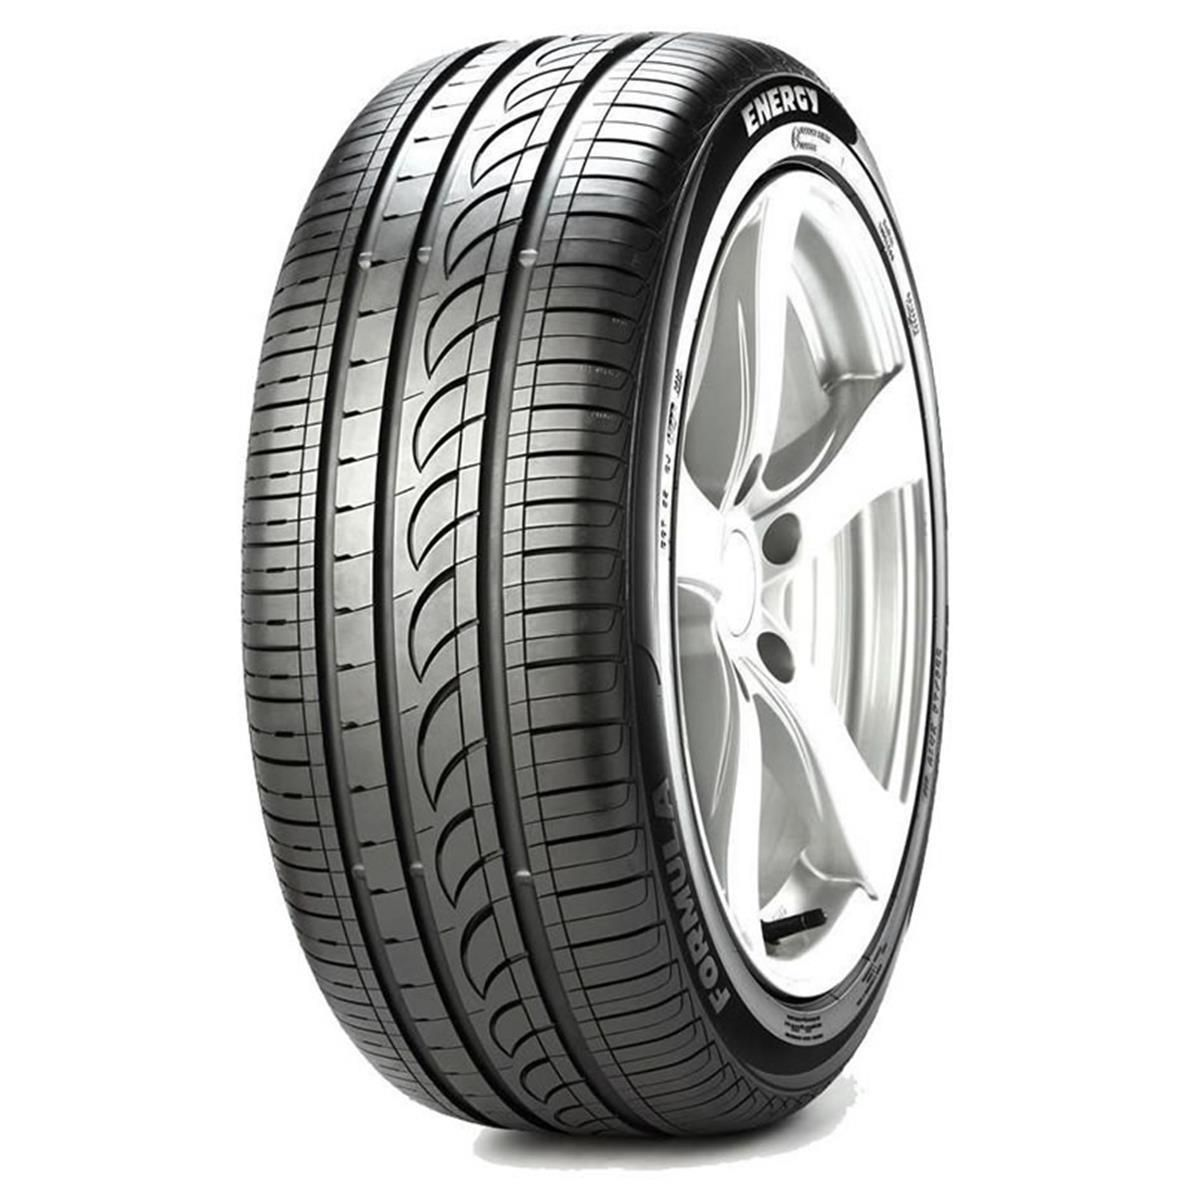 Pneu 175/70 R 13 - Formula Energy 82t - Pirelli